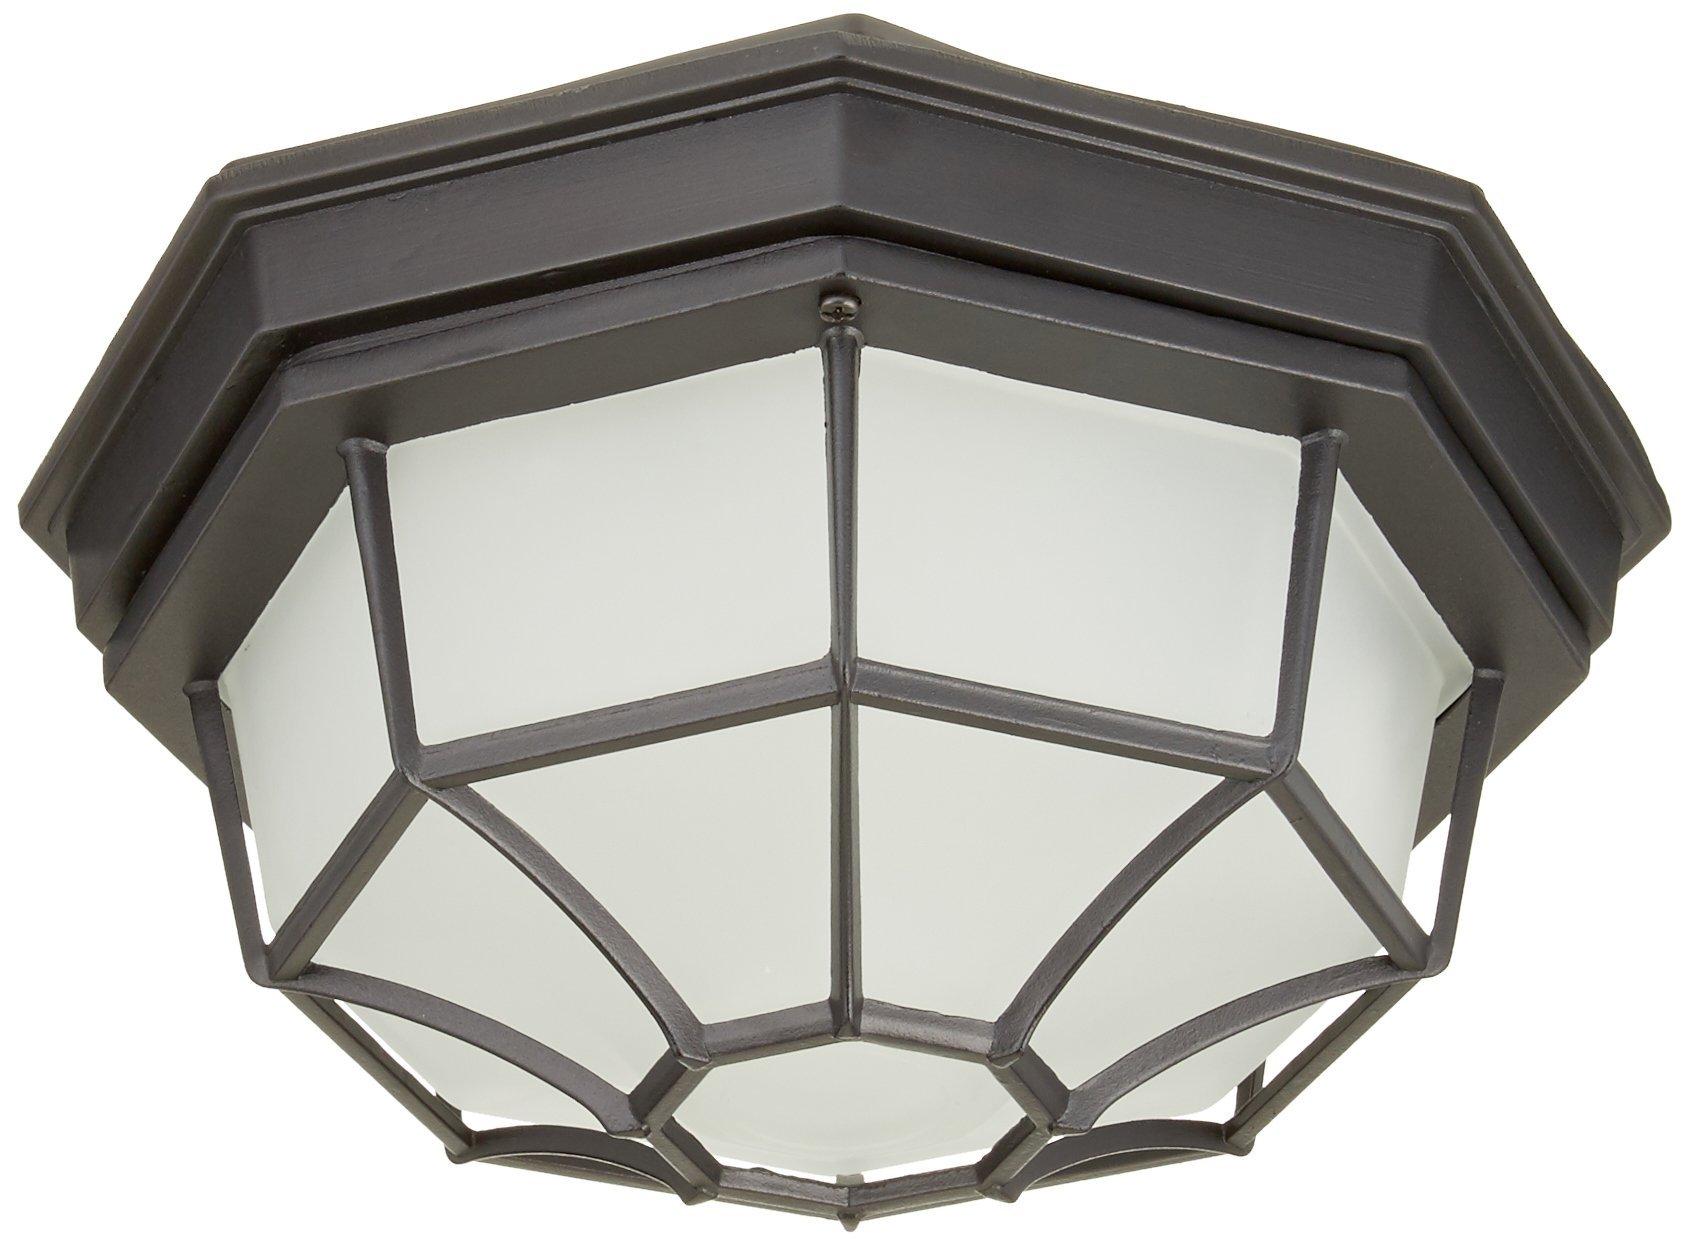 Trans Globe Lighting 40582 BK Outdoor Benkert 5'' Flushmount Lantern, Black